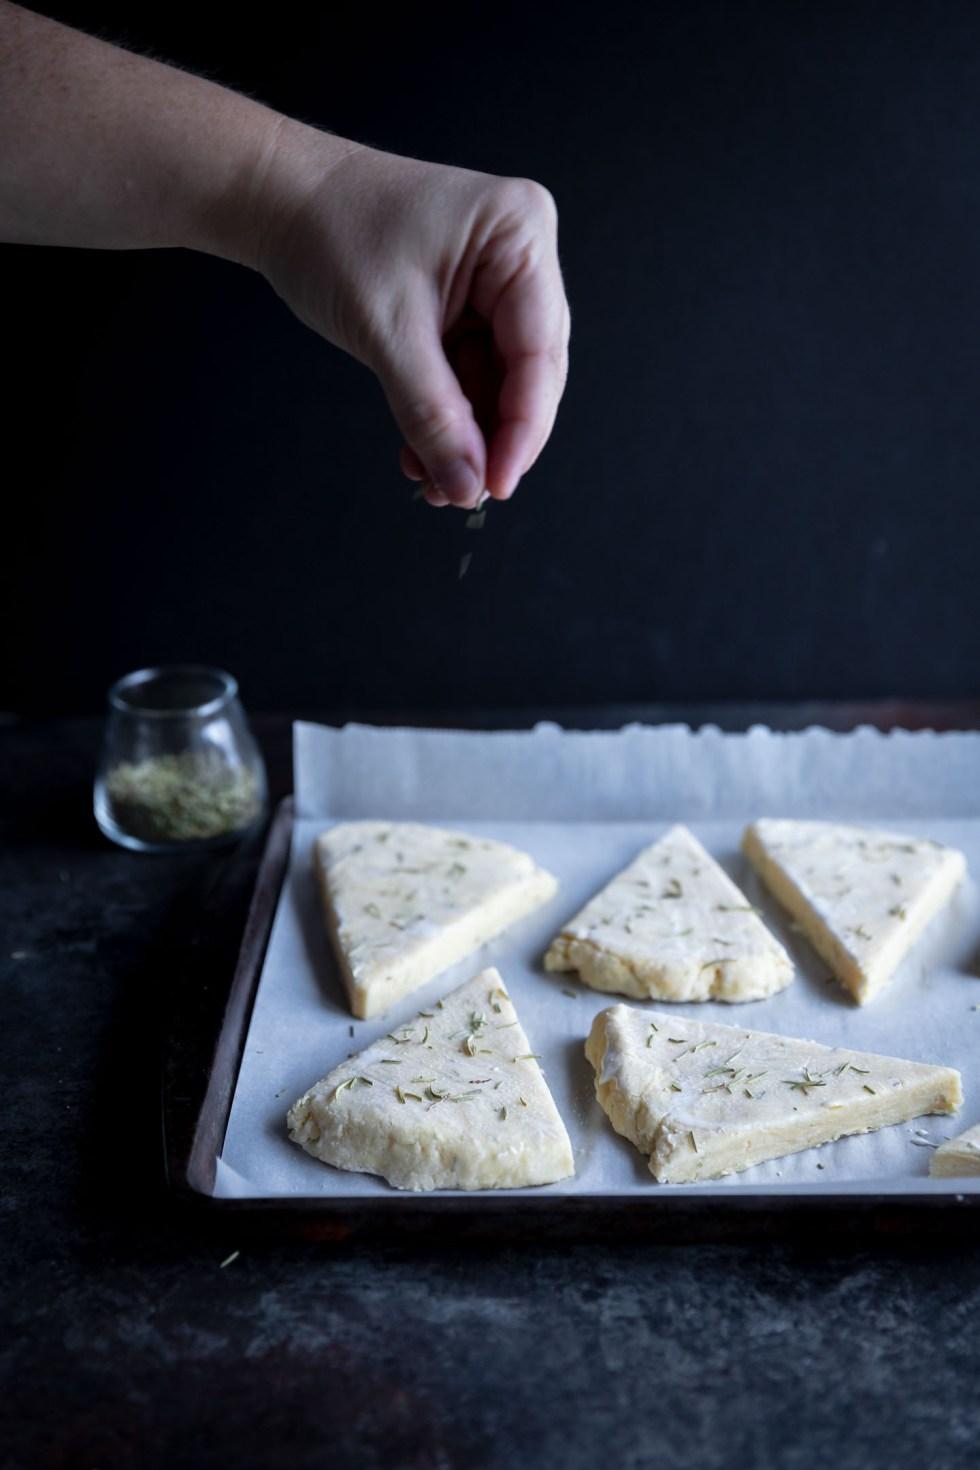 Sprinkling rosemary over scone dough triangles.